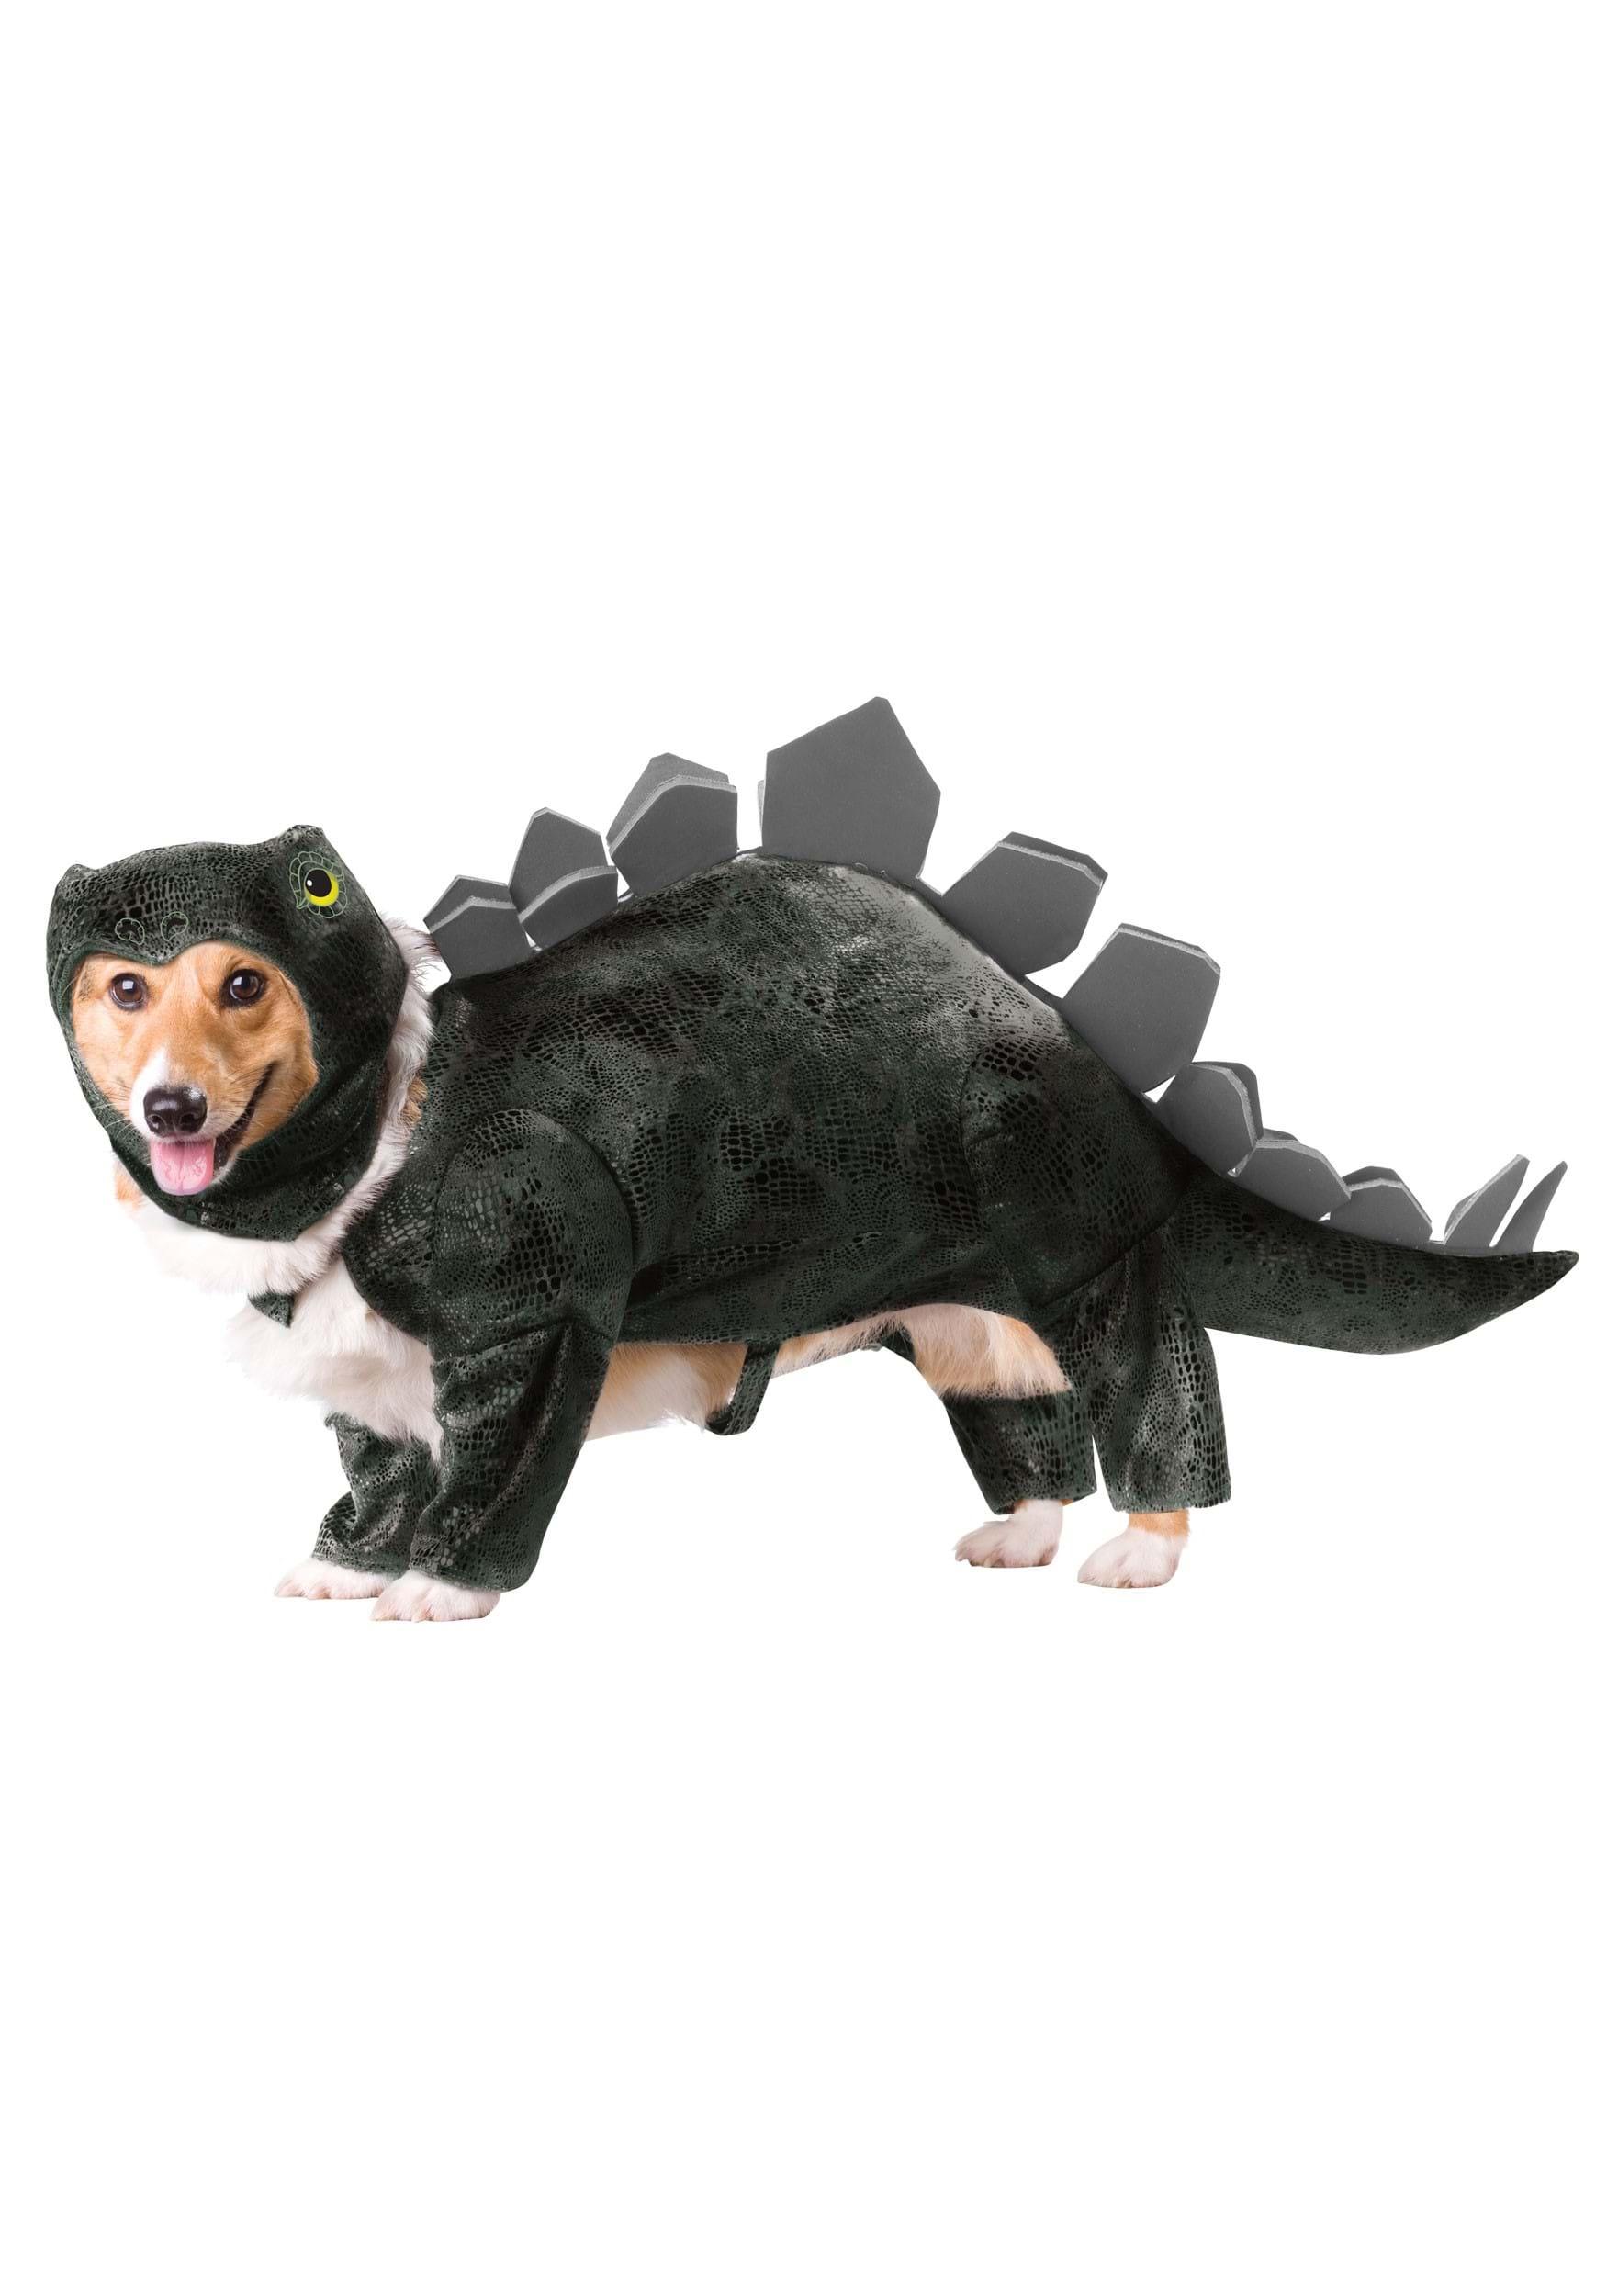 f7a9f24d9e0a Pet Costumes - Cat   Dog Halloween Costumes - HalloweenCostumes.com